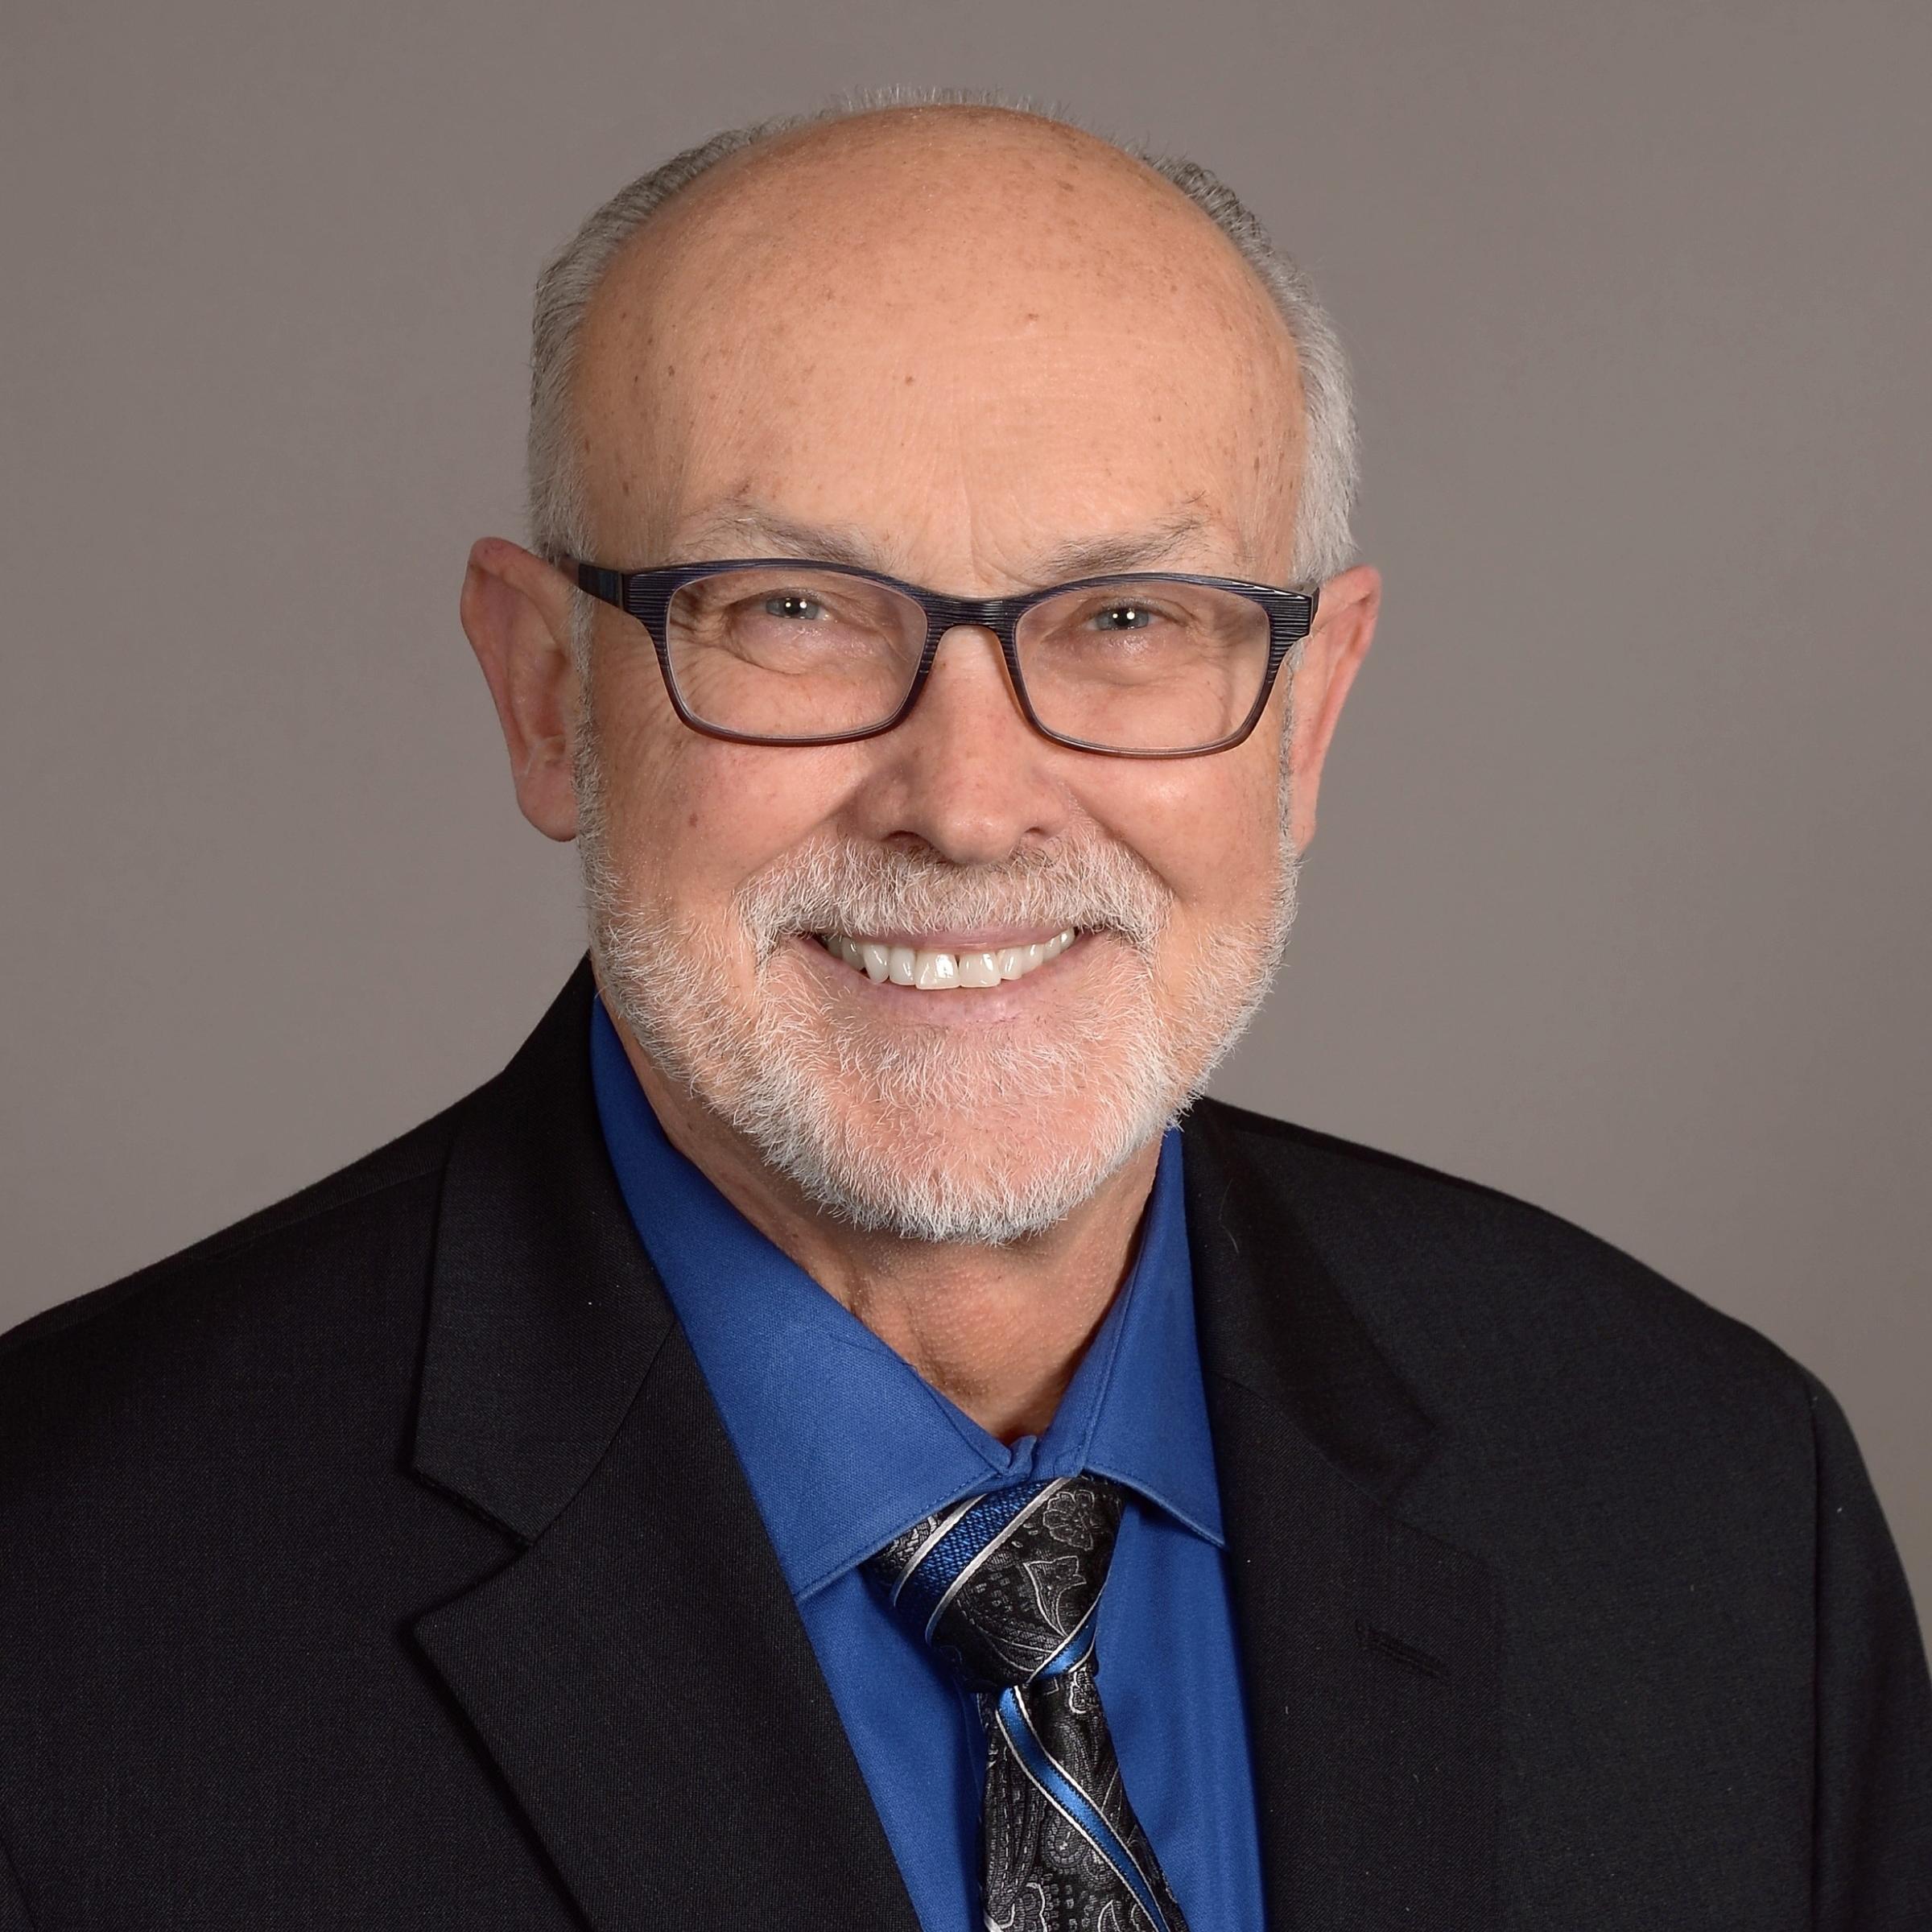 Jack Groppel, PhD